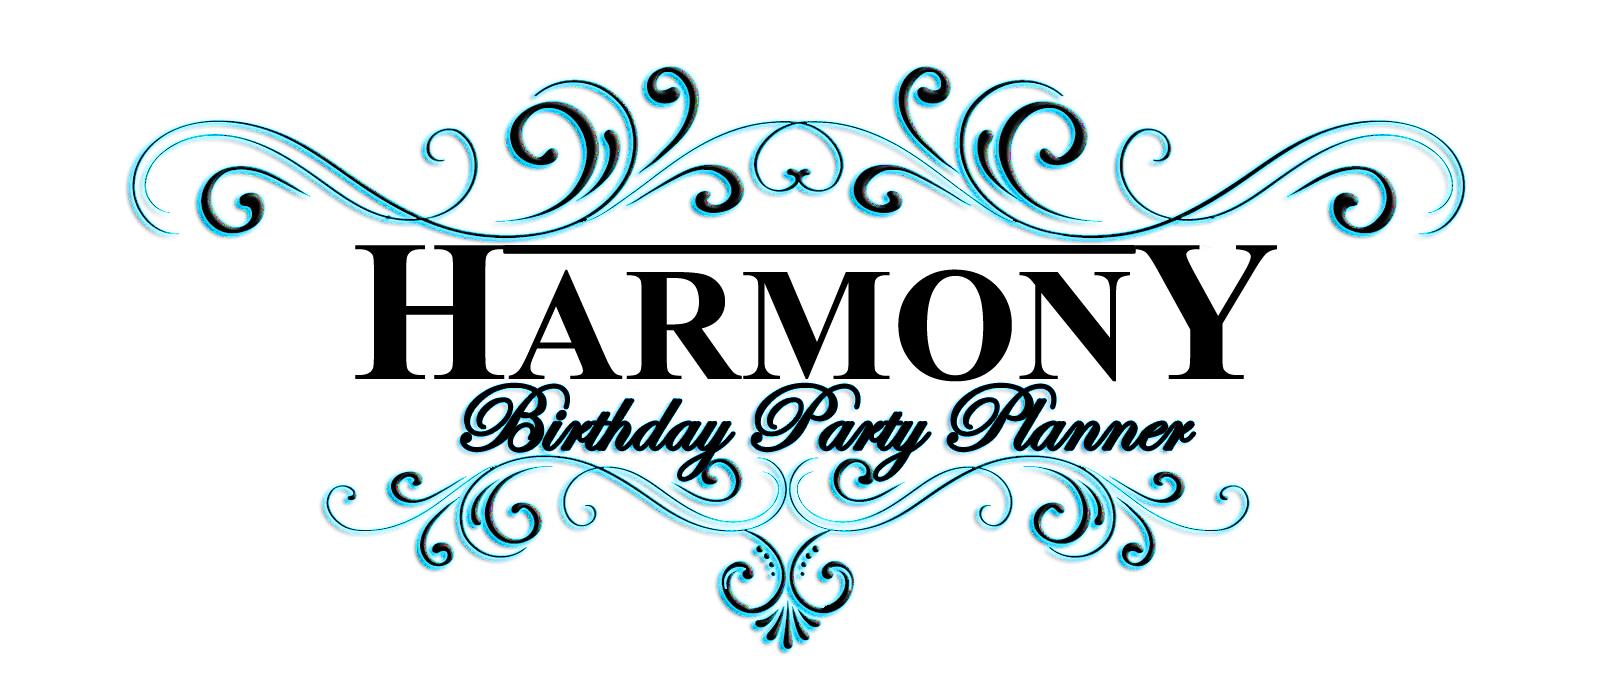 Harmony Birthday Party Planner